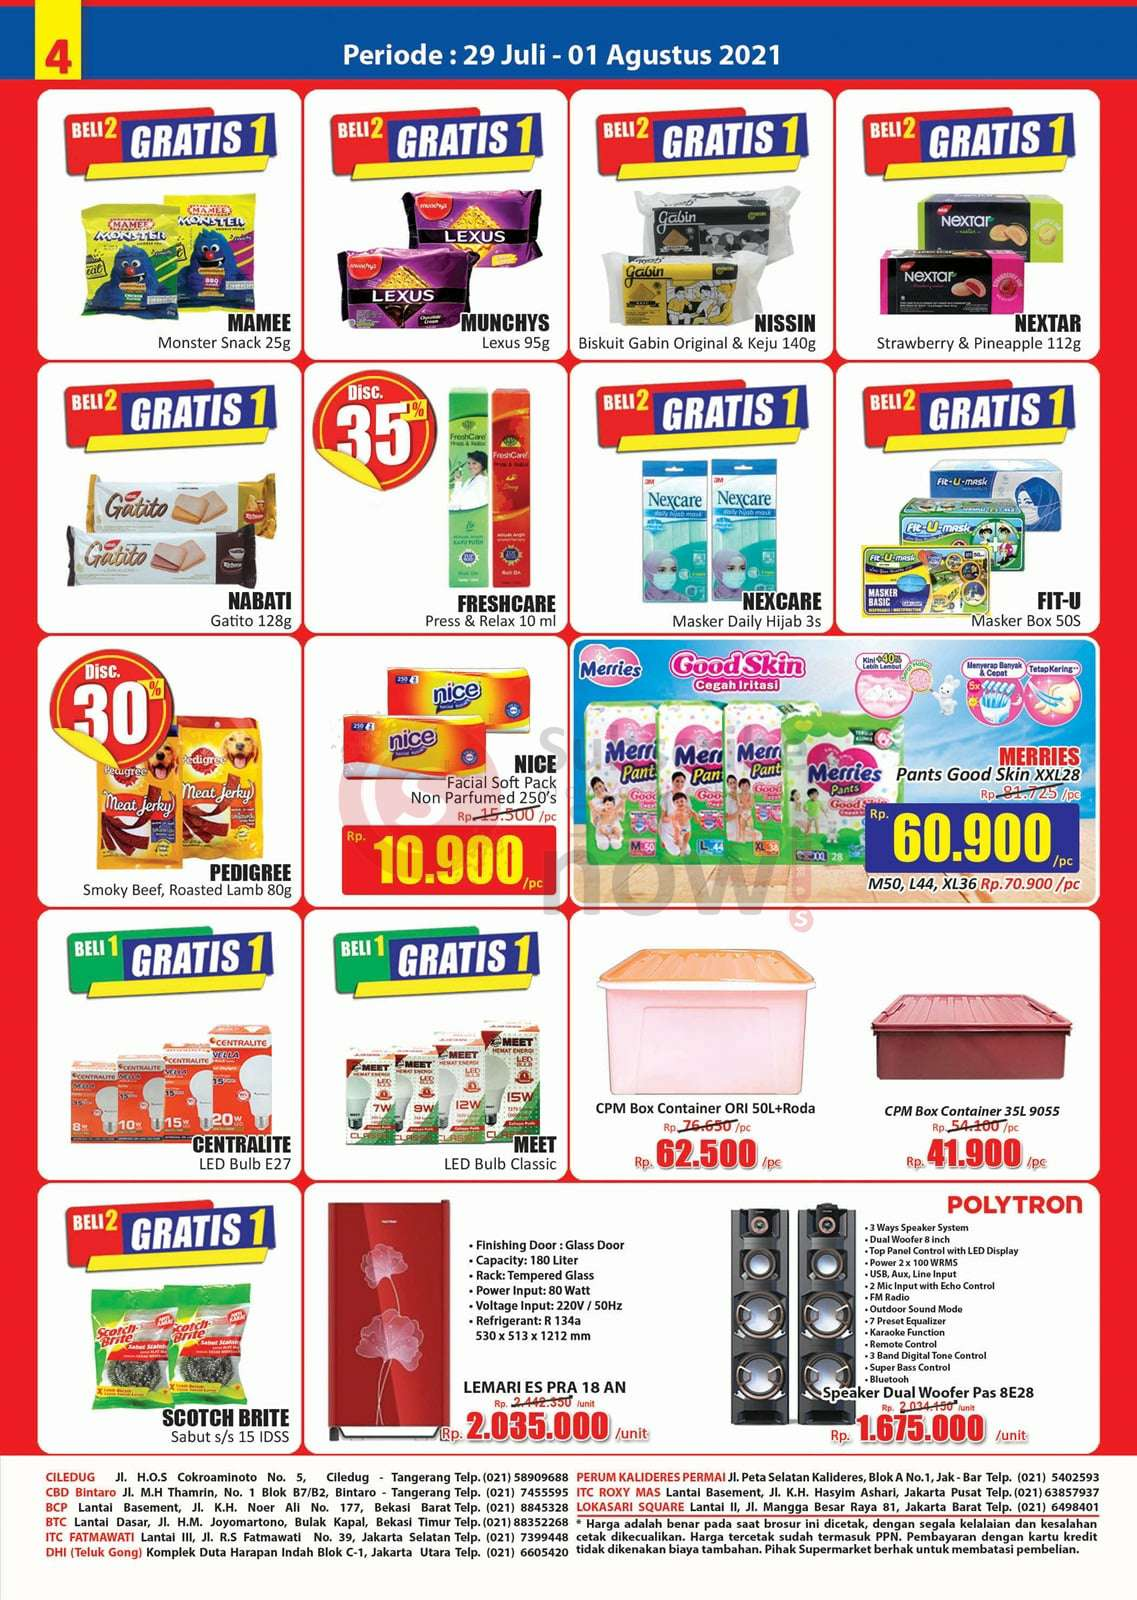 Katalog Promo JSM Hari Hari Swalayan Weekend 29 Juli - 1 Agustus 2021 4